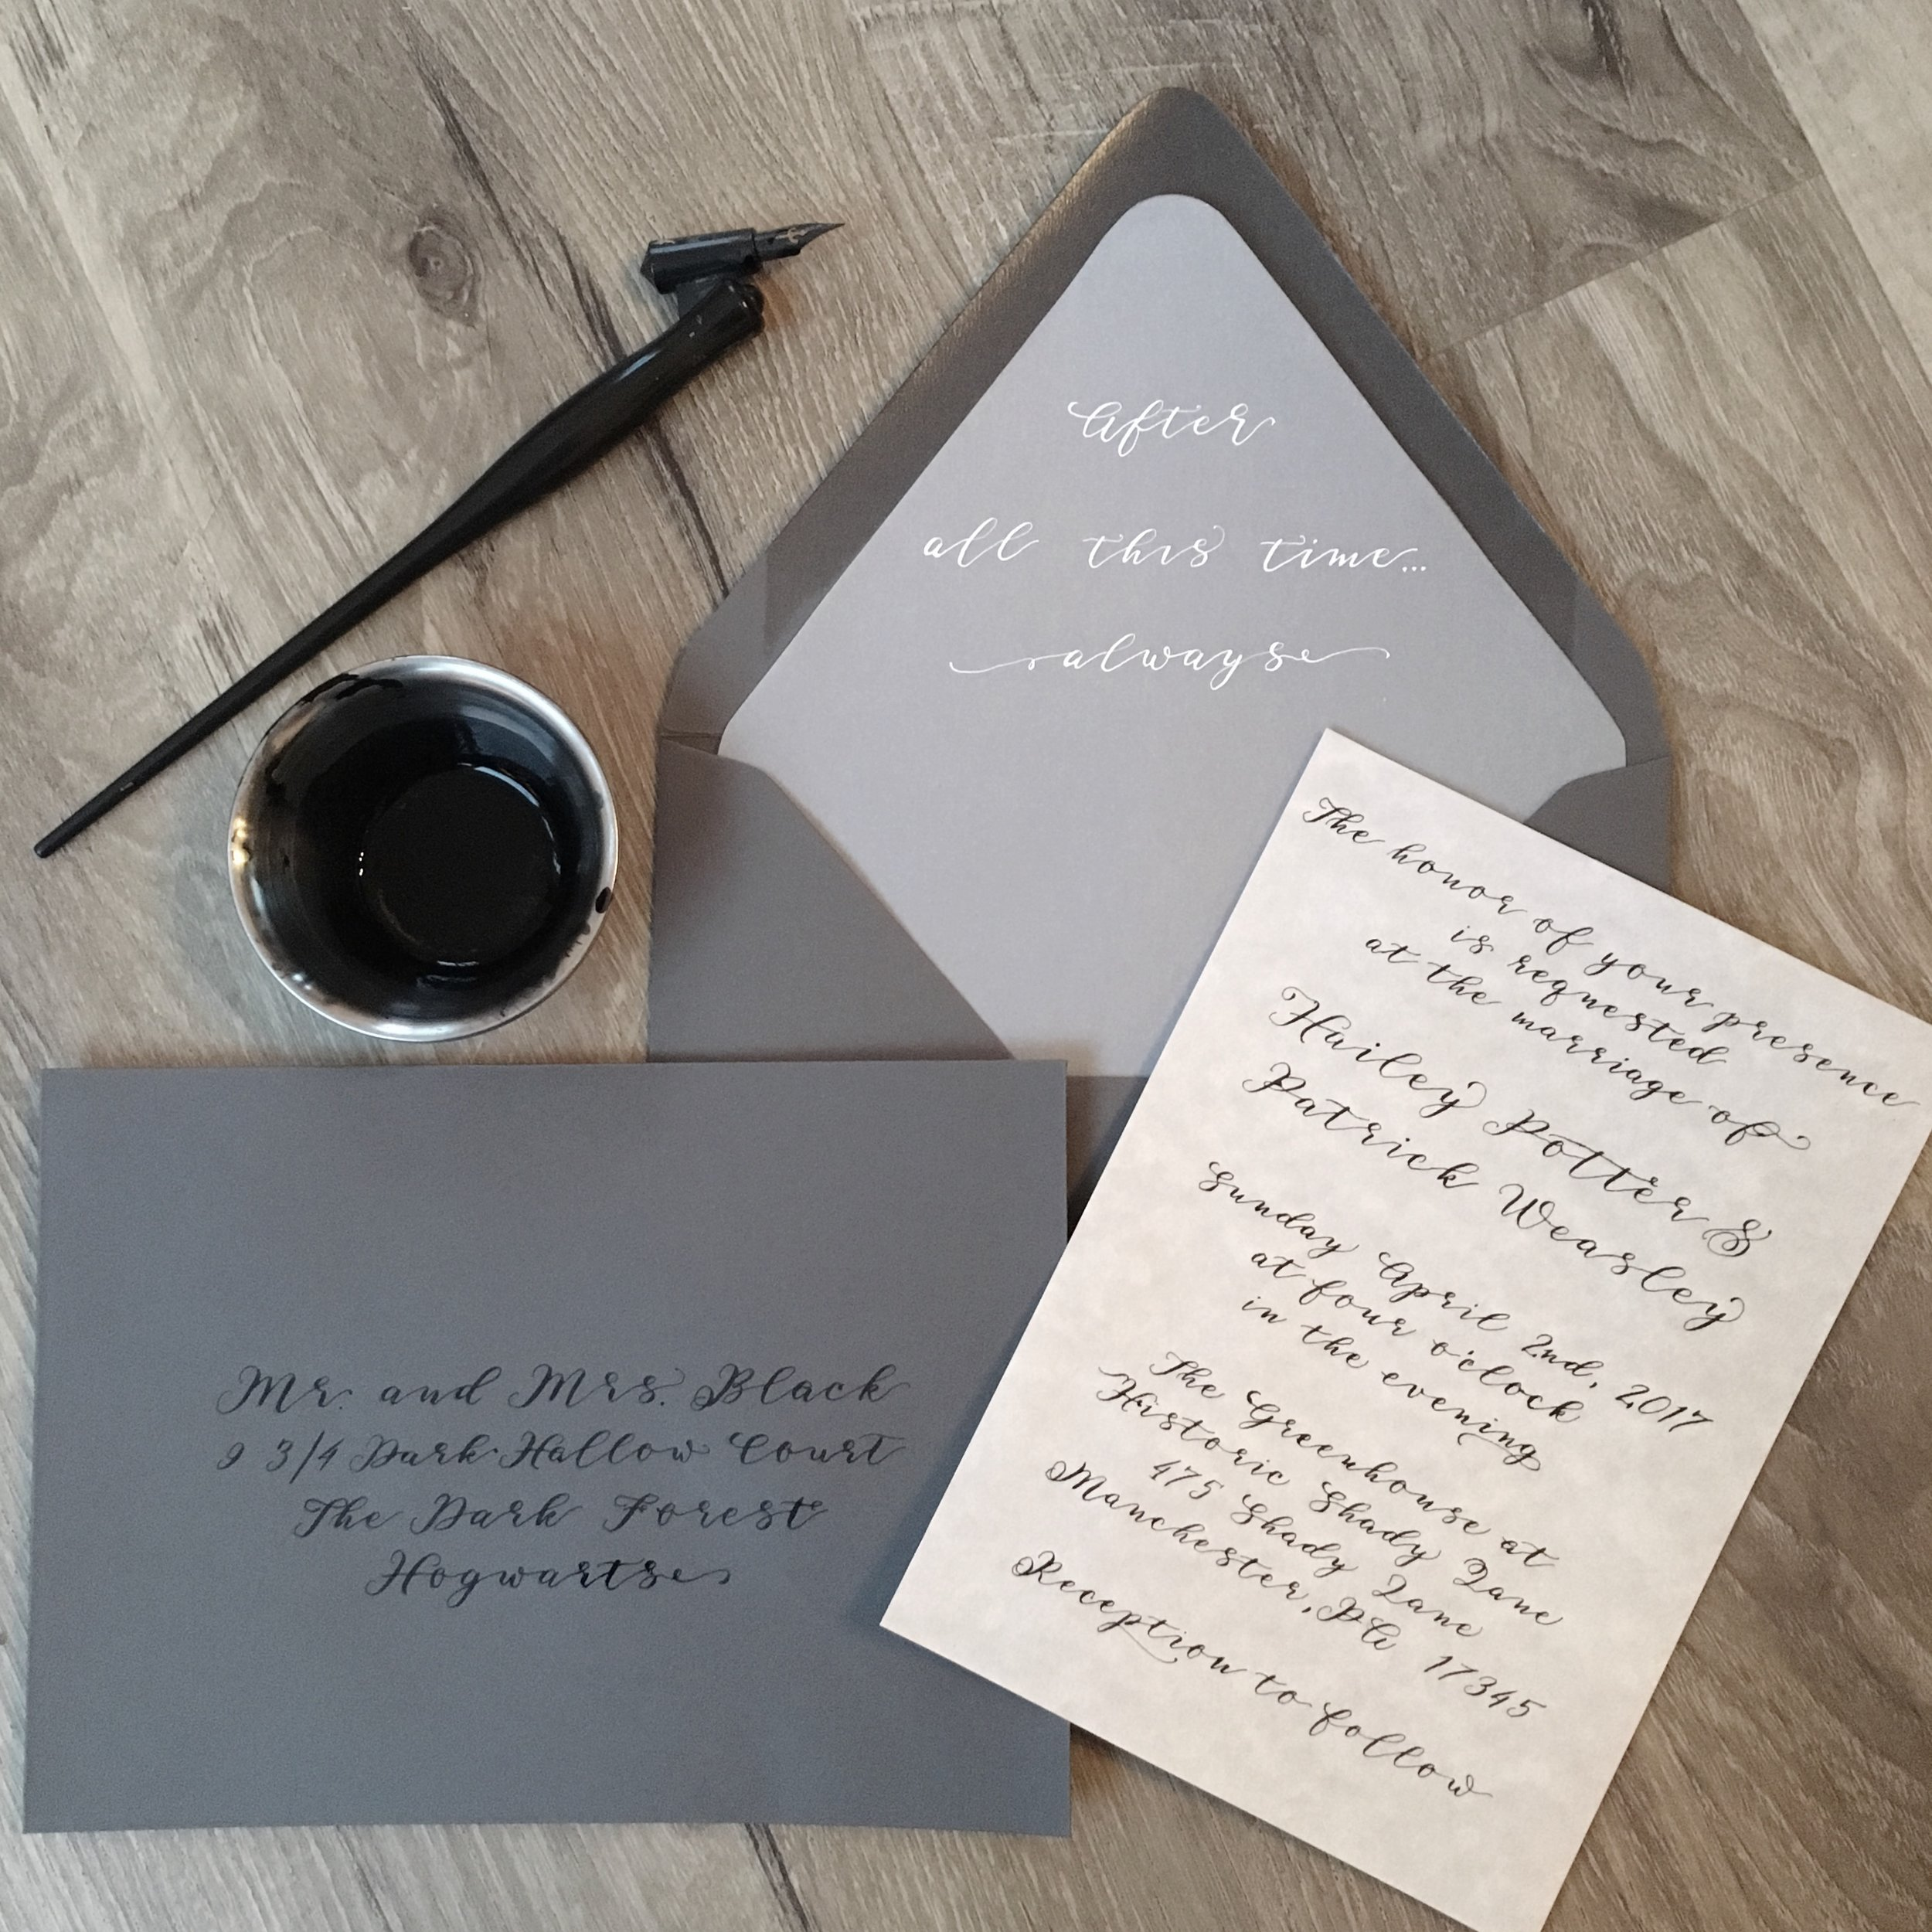 Central PA, York PA, JesSmith Designs, custom, wedding, invitations, bridal, announcements, save the date-03-31 19.22.30.jpg